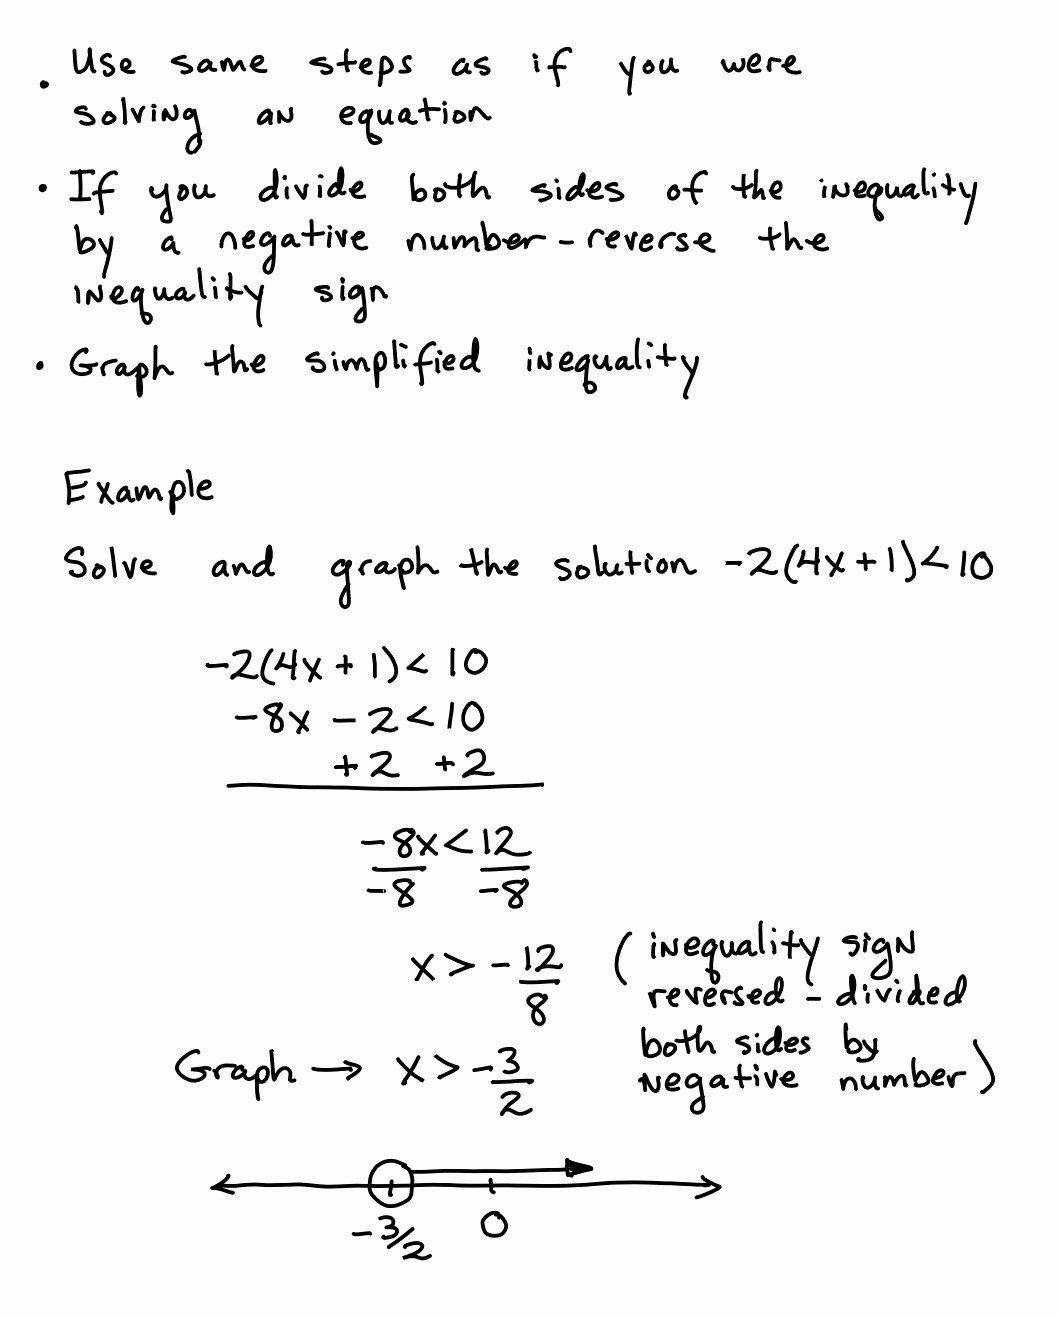 50 Solving Linear Inequalities Worksheet In 2020 Linear Inequalities Solving Linear Equations Interactive Math Journals